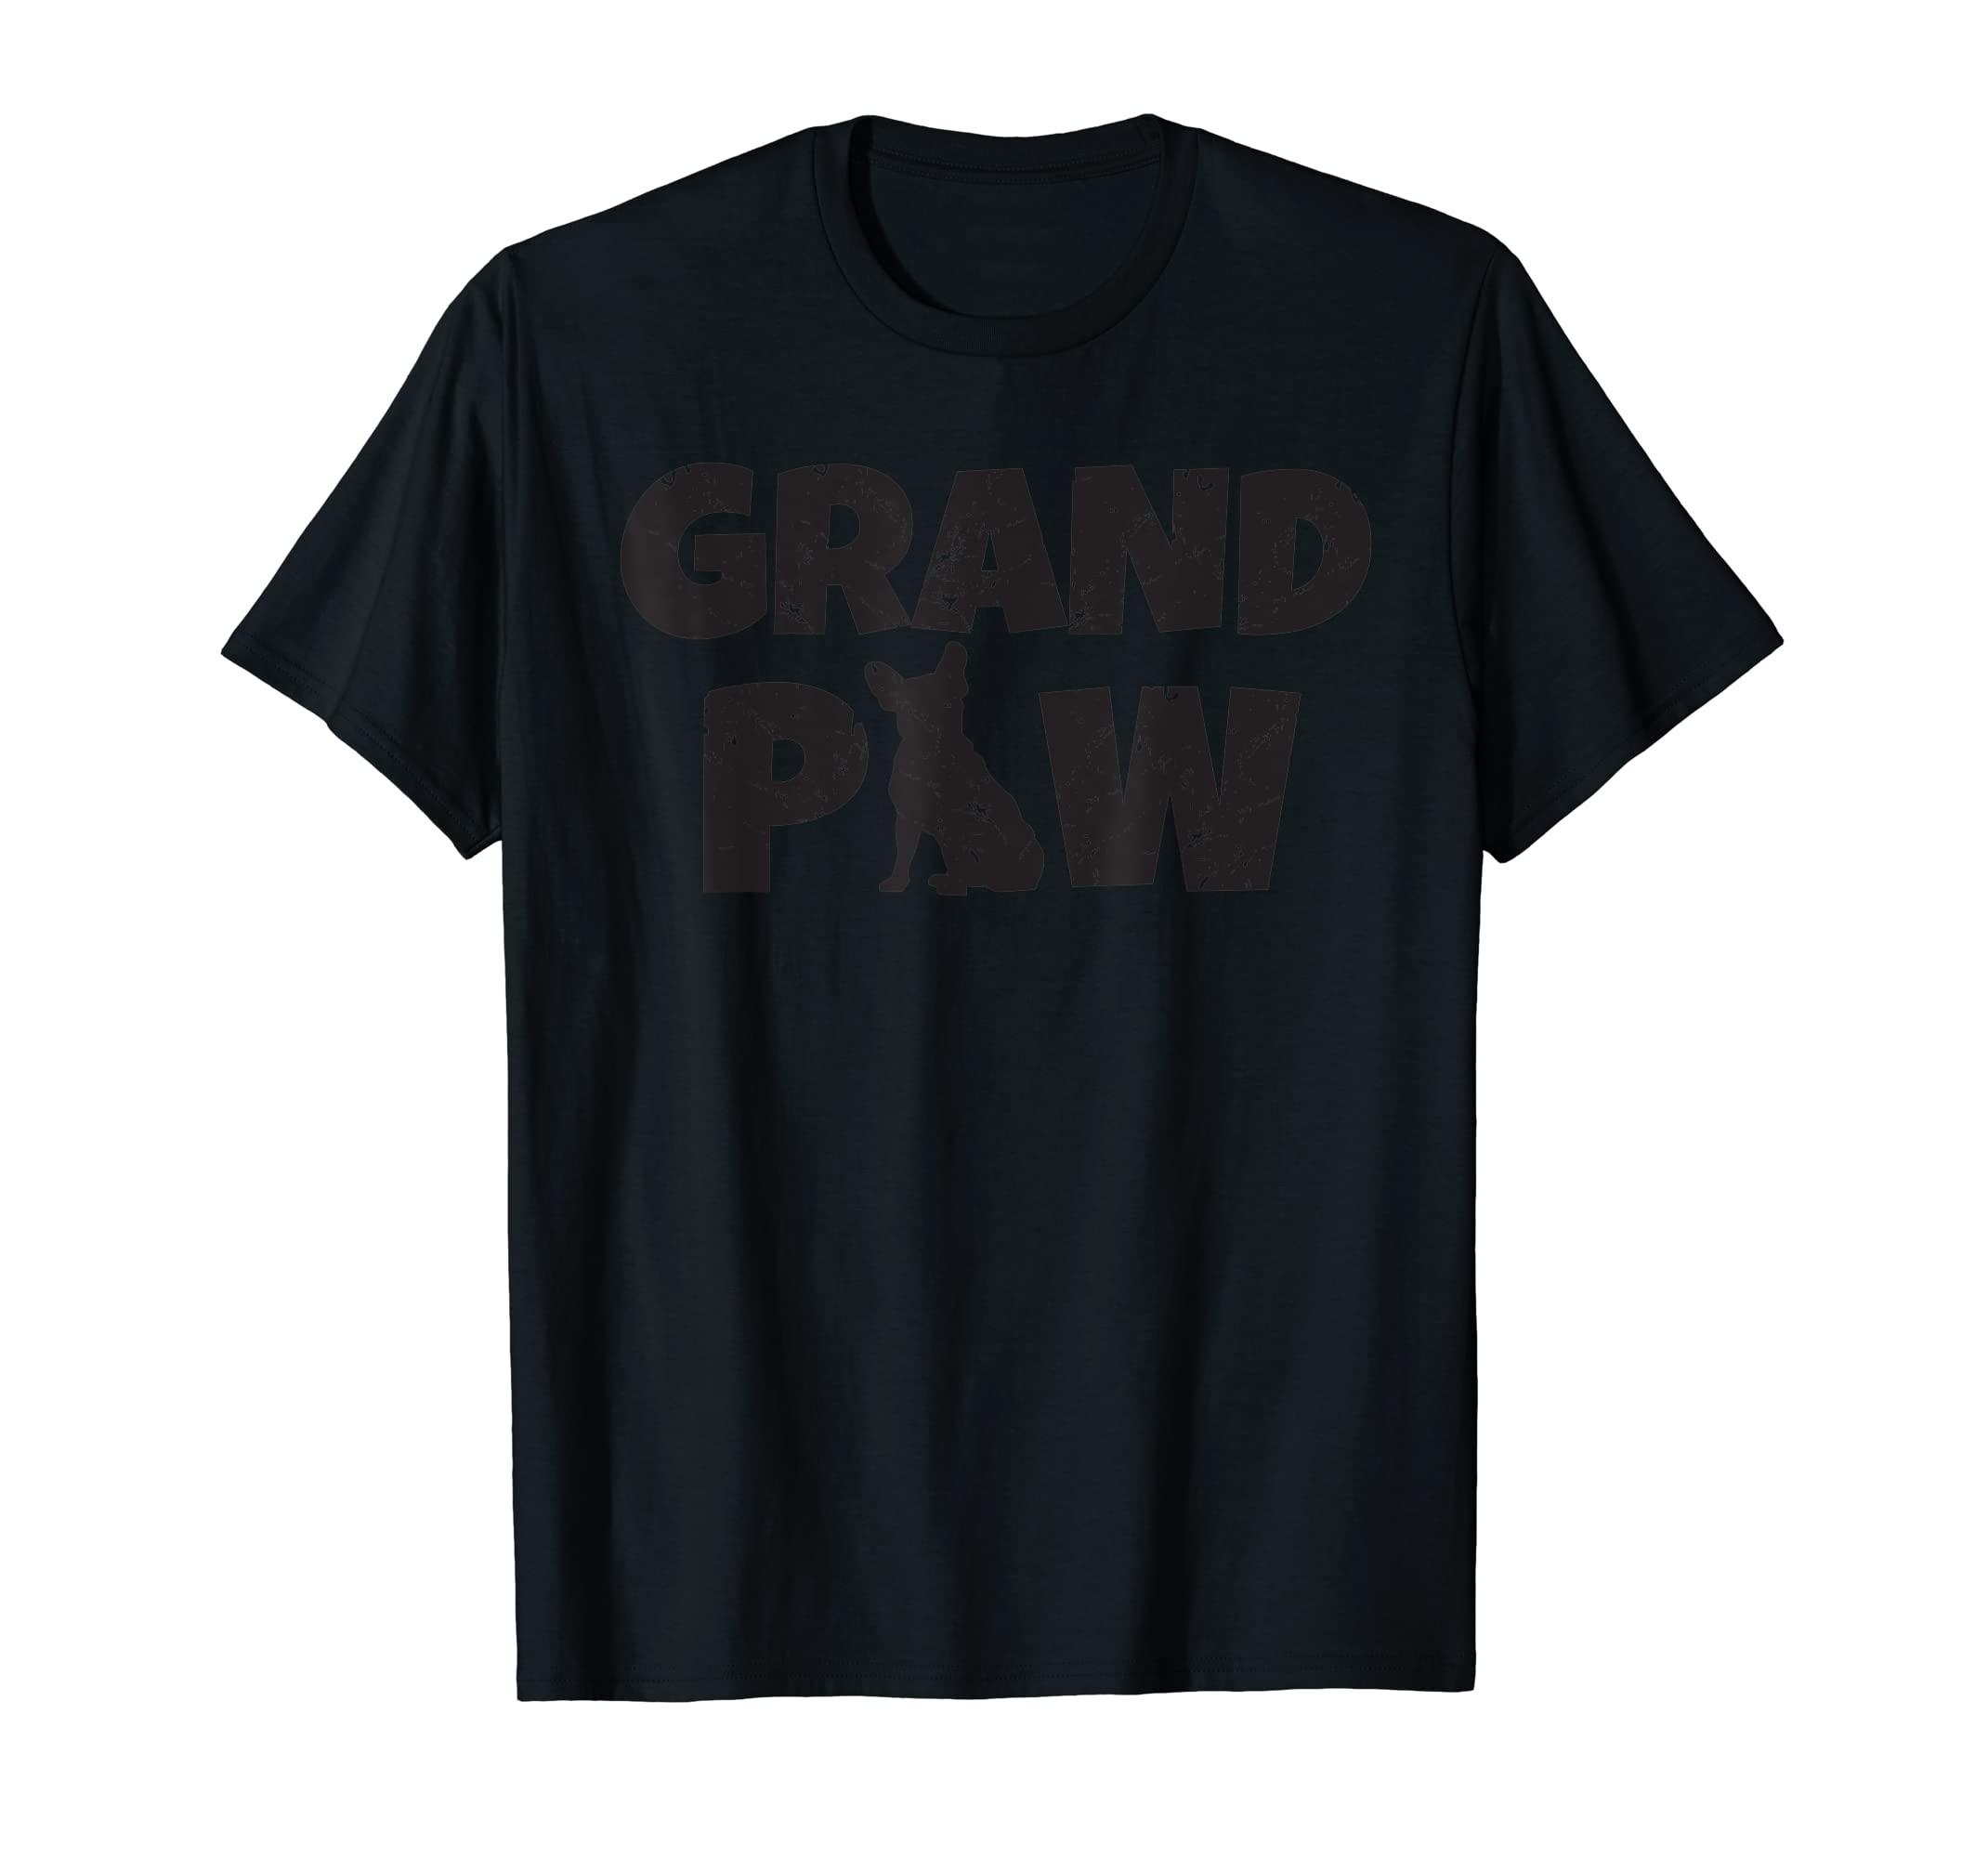 French Bulldog Grandpa Grand Paw T Shirt Dog Lovers Grandpaw-Men's T-Shirt-Black